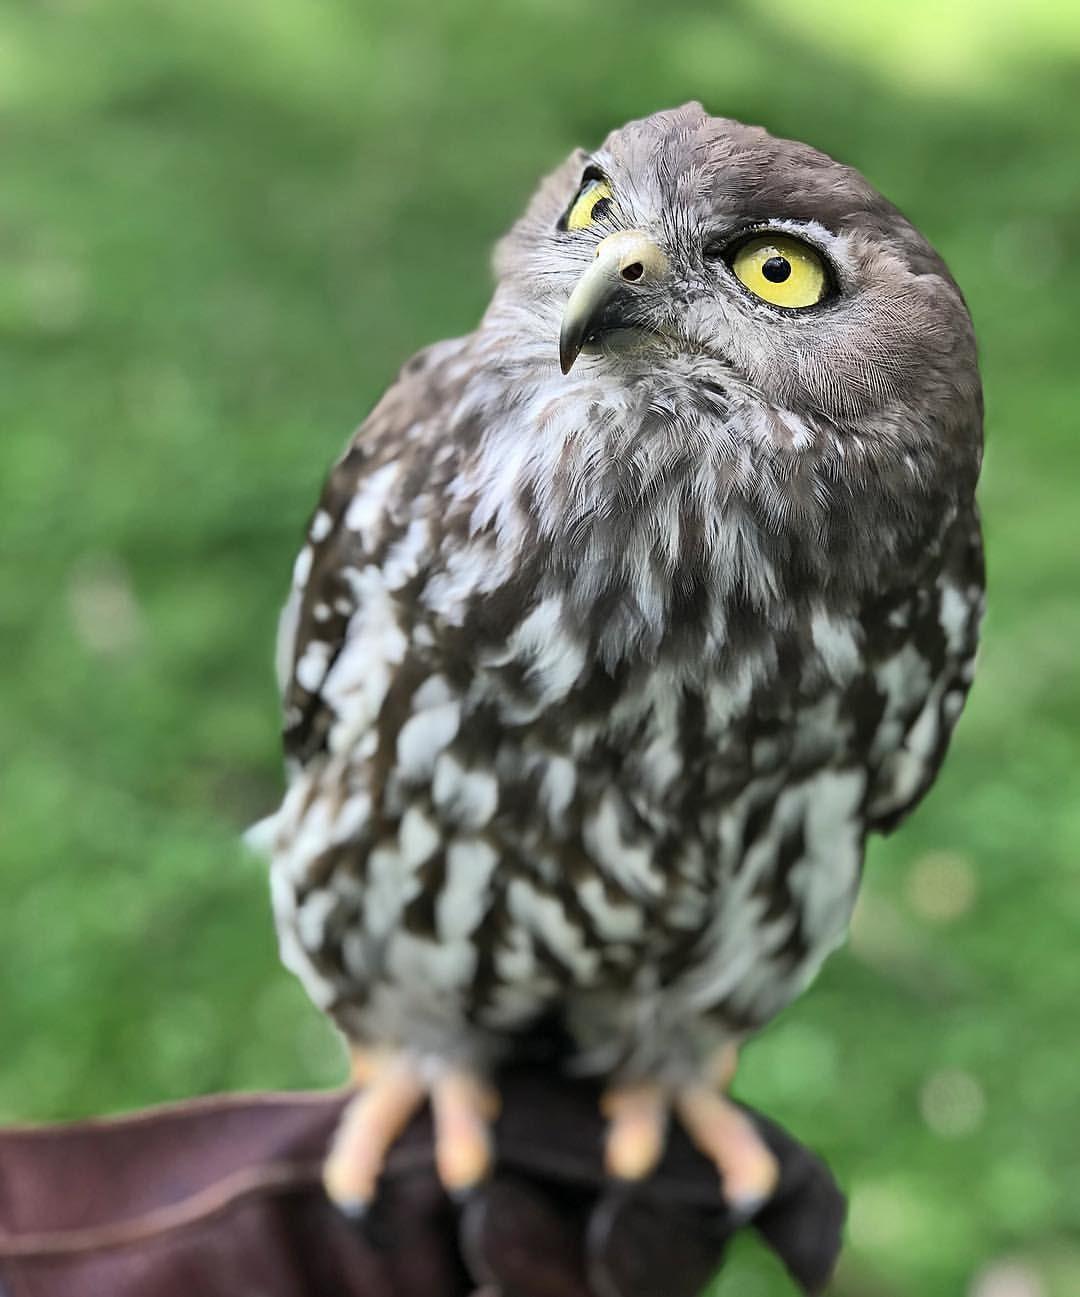 1 142 Likes 13 Comments A Bird With Beliefs Tbonesjones On Instagram Barking Owl Owls Drawing Baby Owls Owl Art